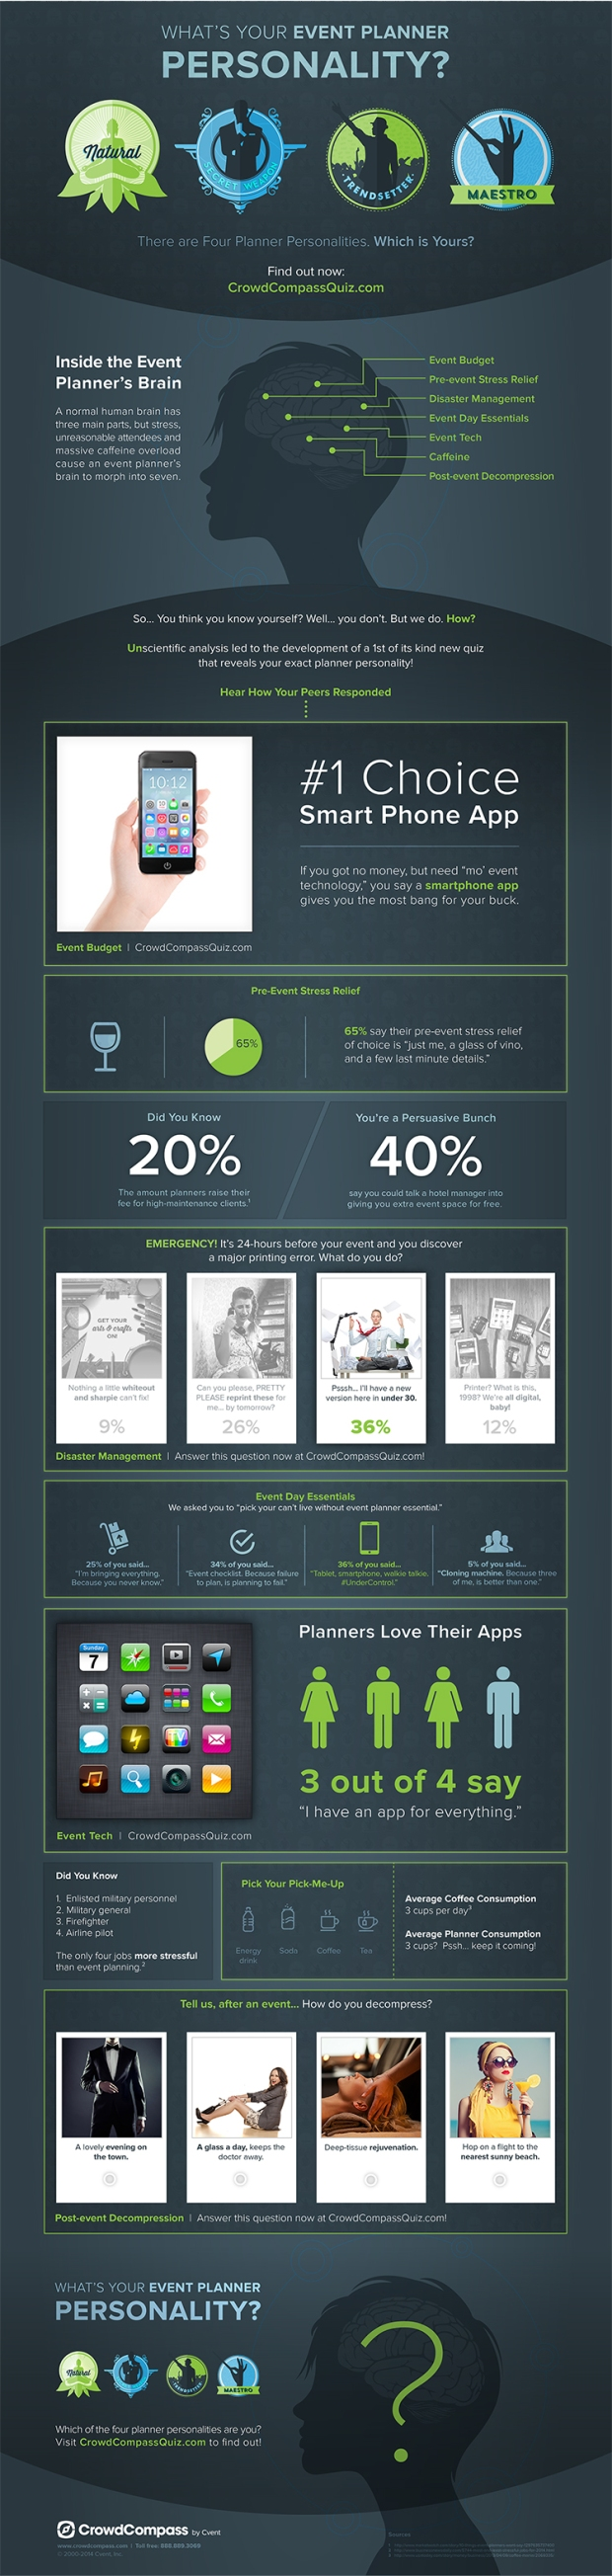 cc_infographic_122914_72ppi